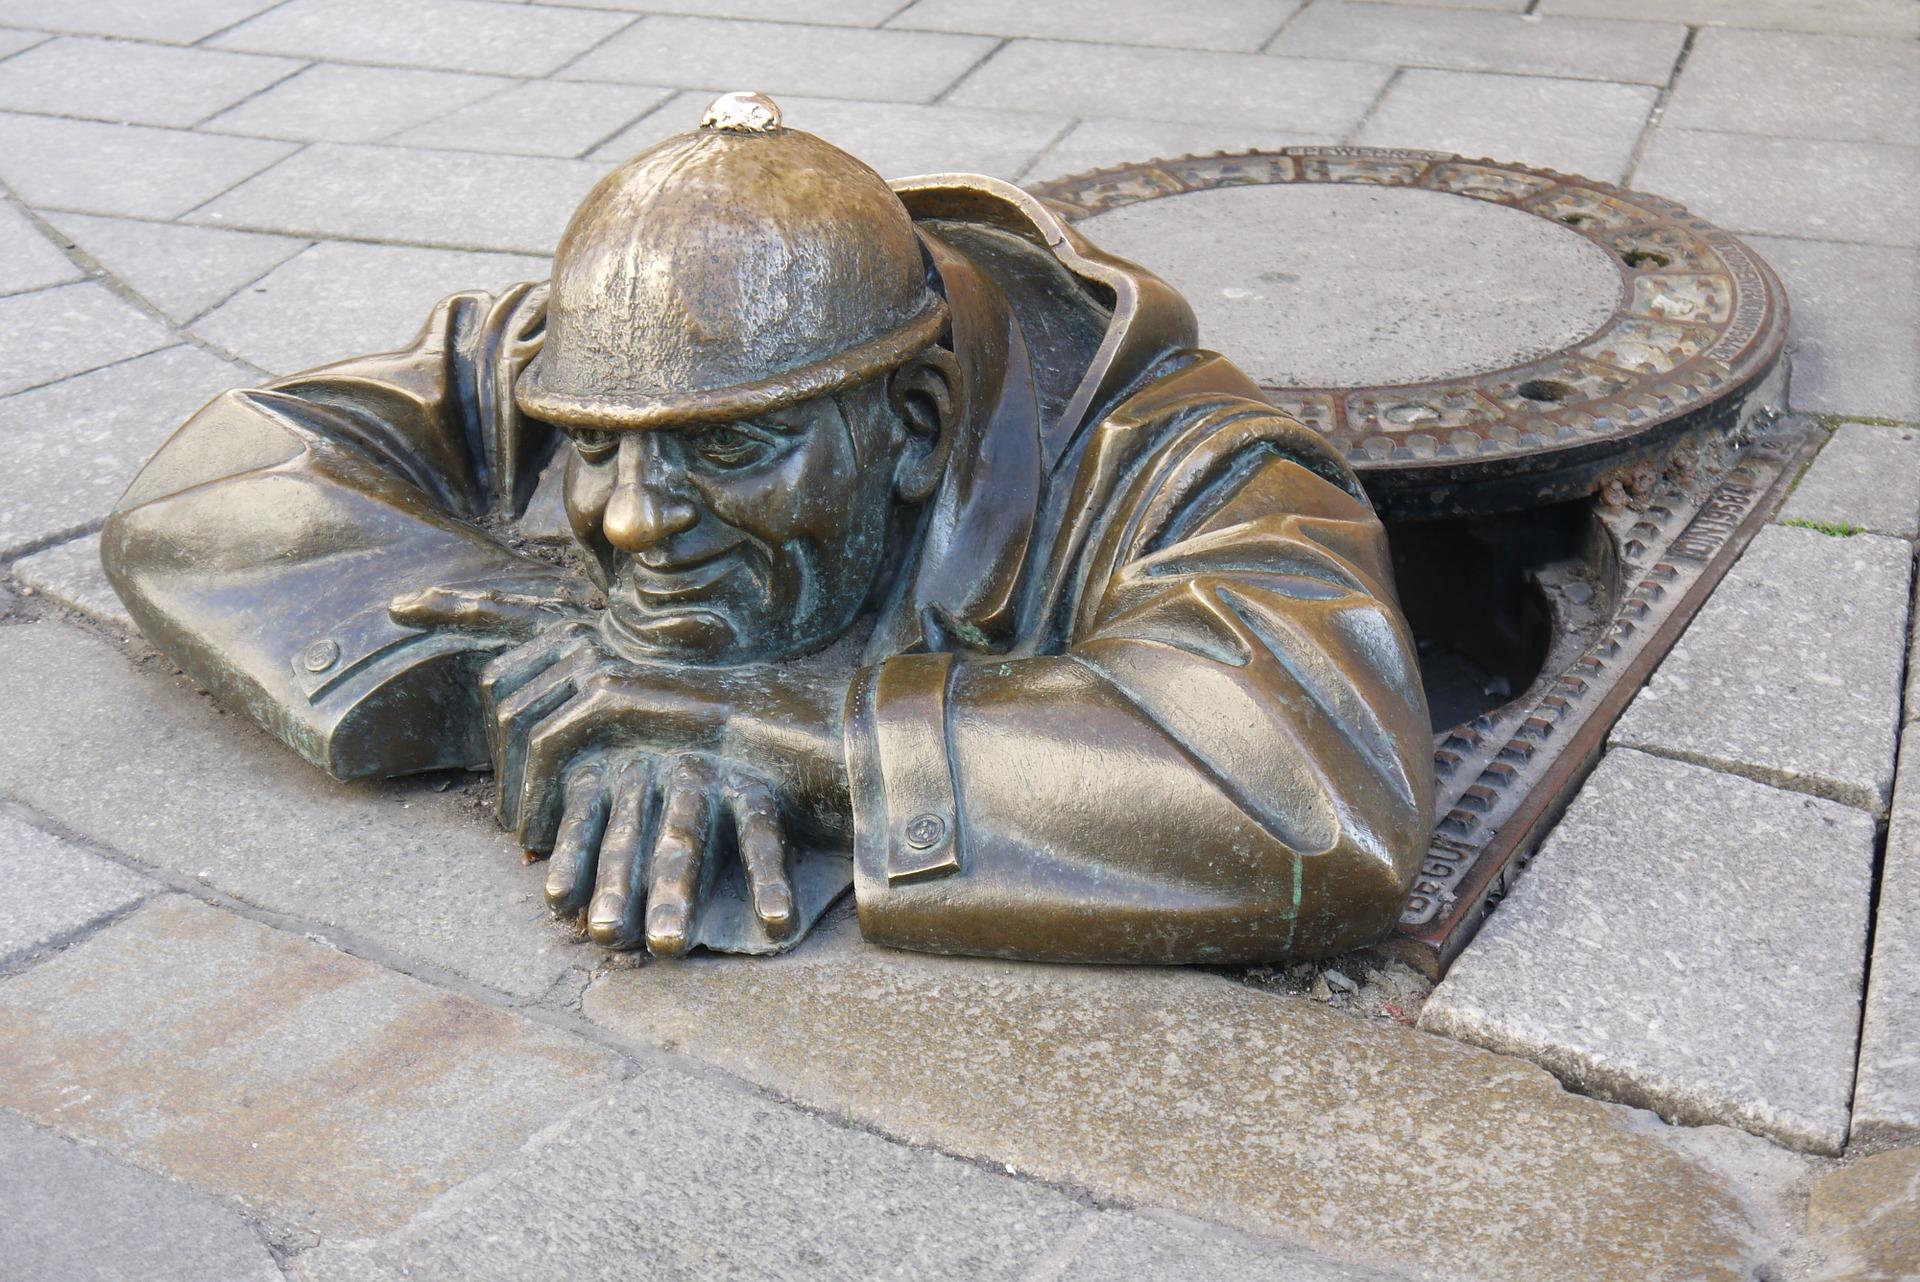 sculpture-1007990_1920